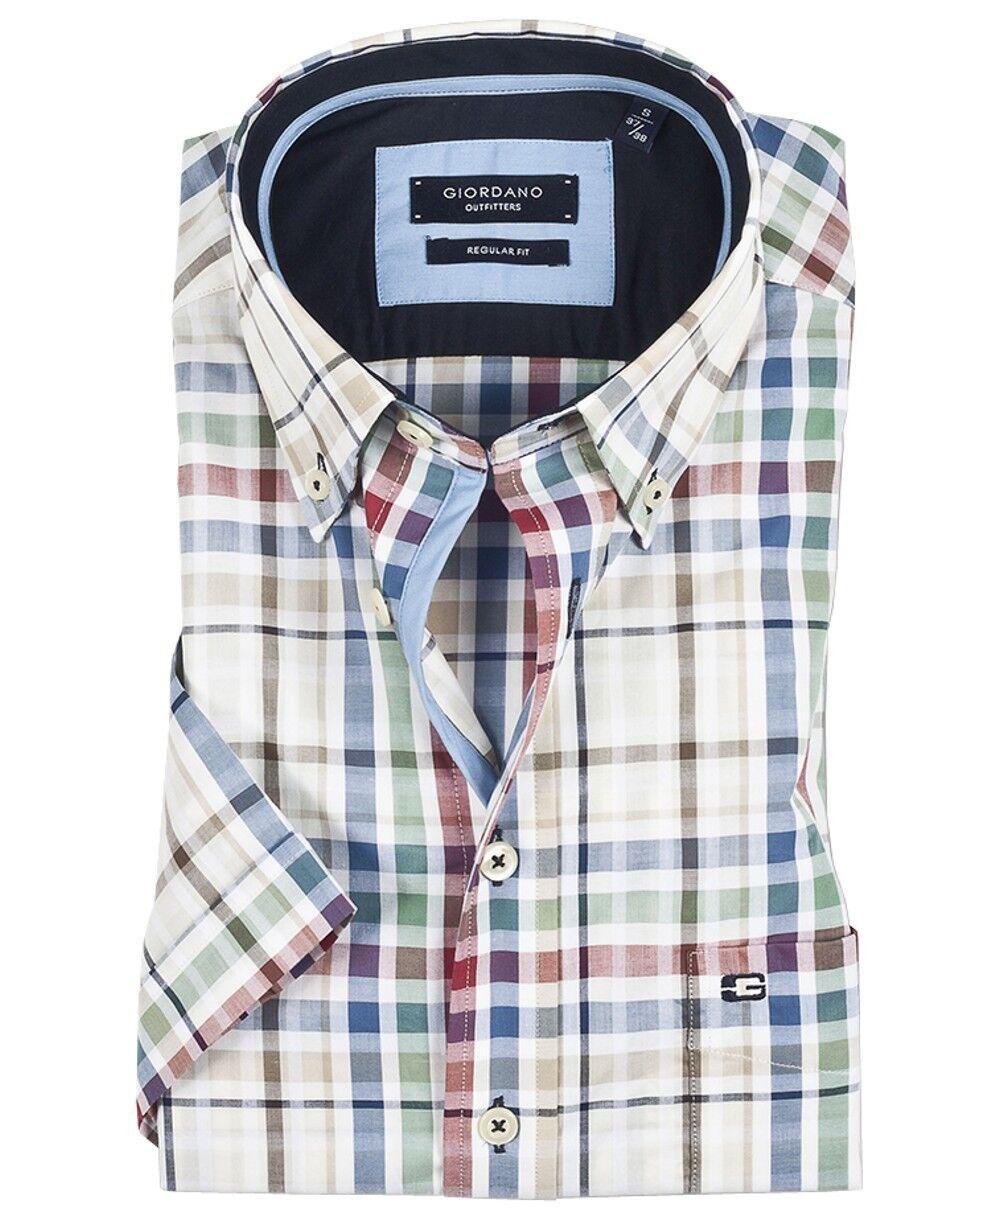 Giordano fushia Sunset hommeches courtes regular fit taille XL à 3xl Blanc Bleu Rouge Vert